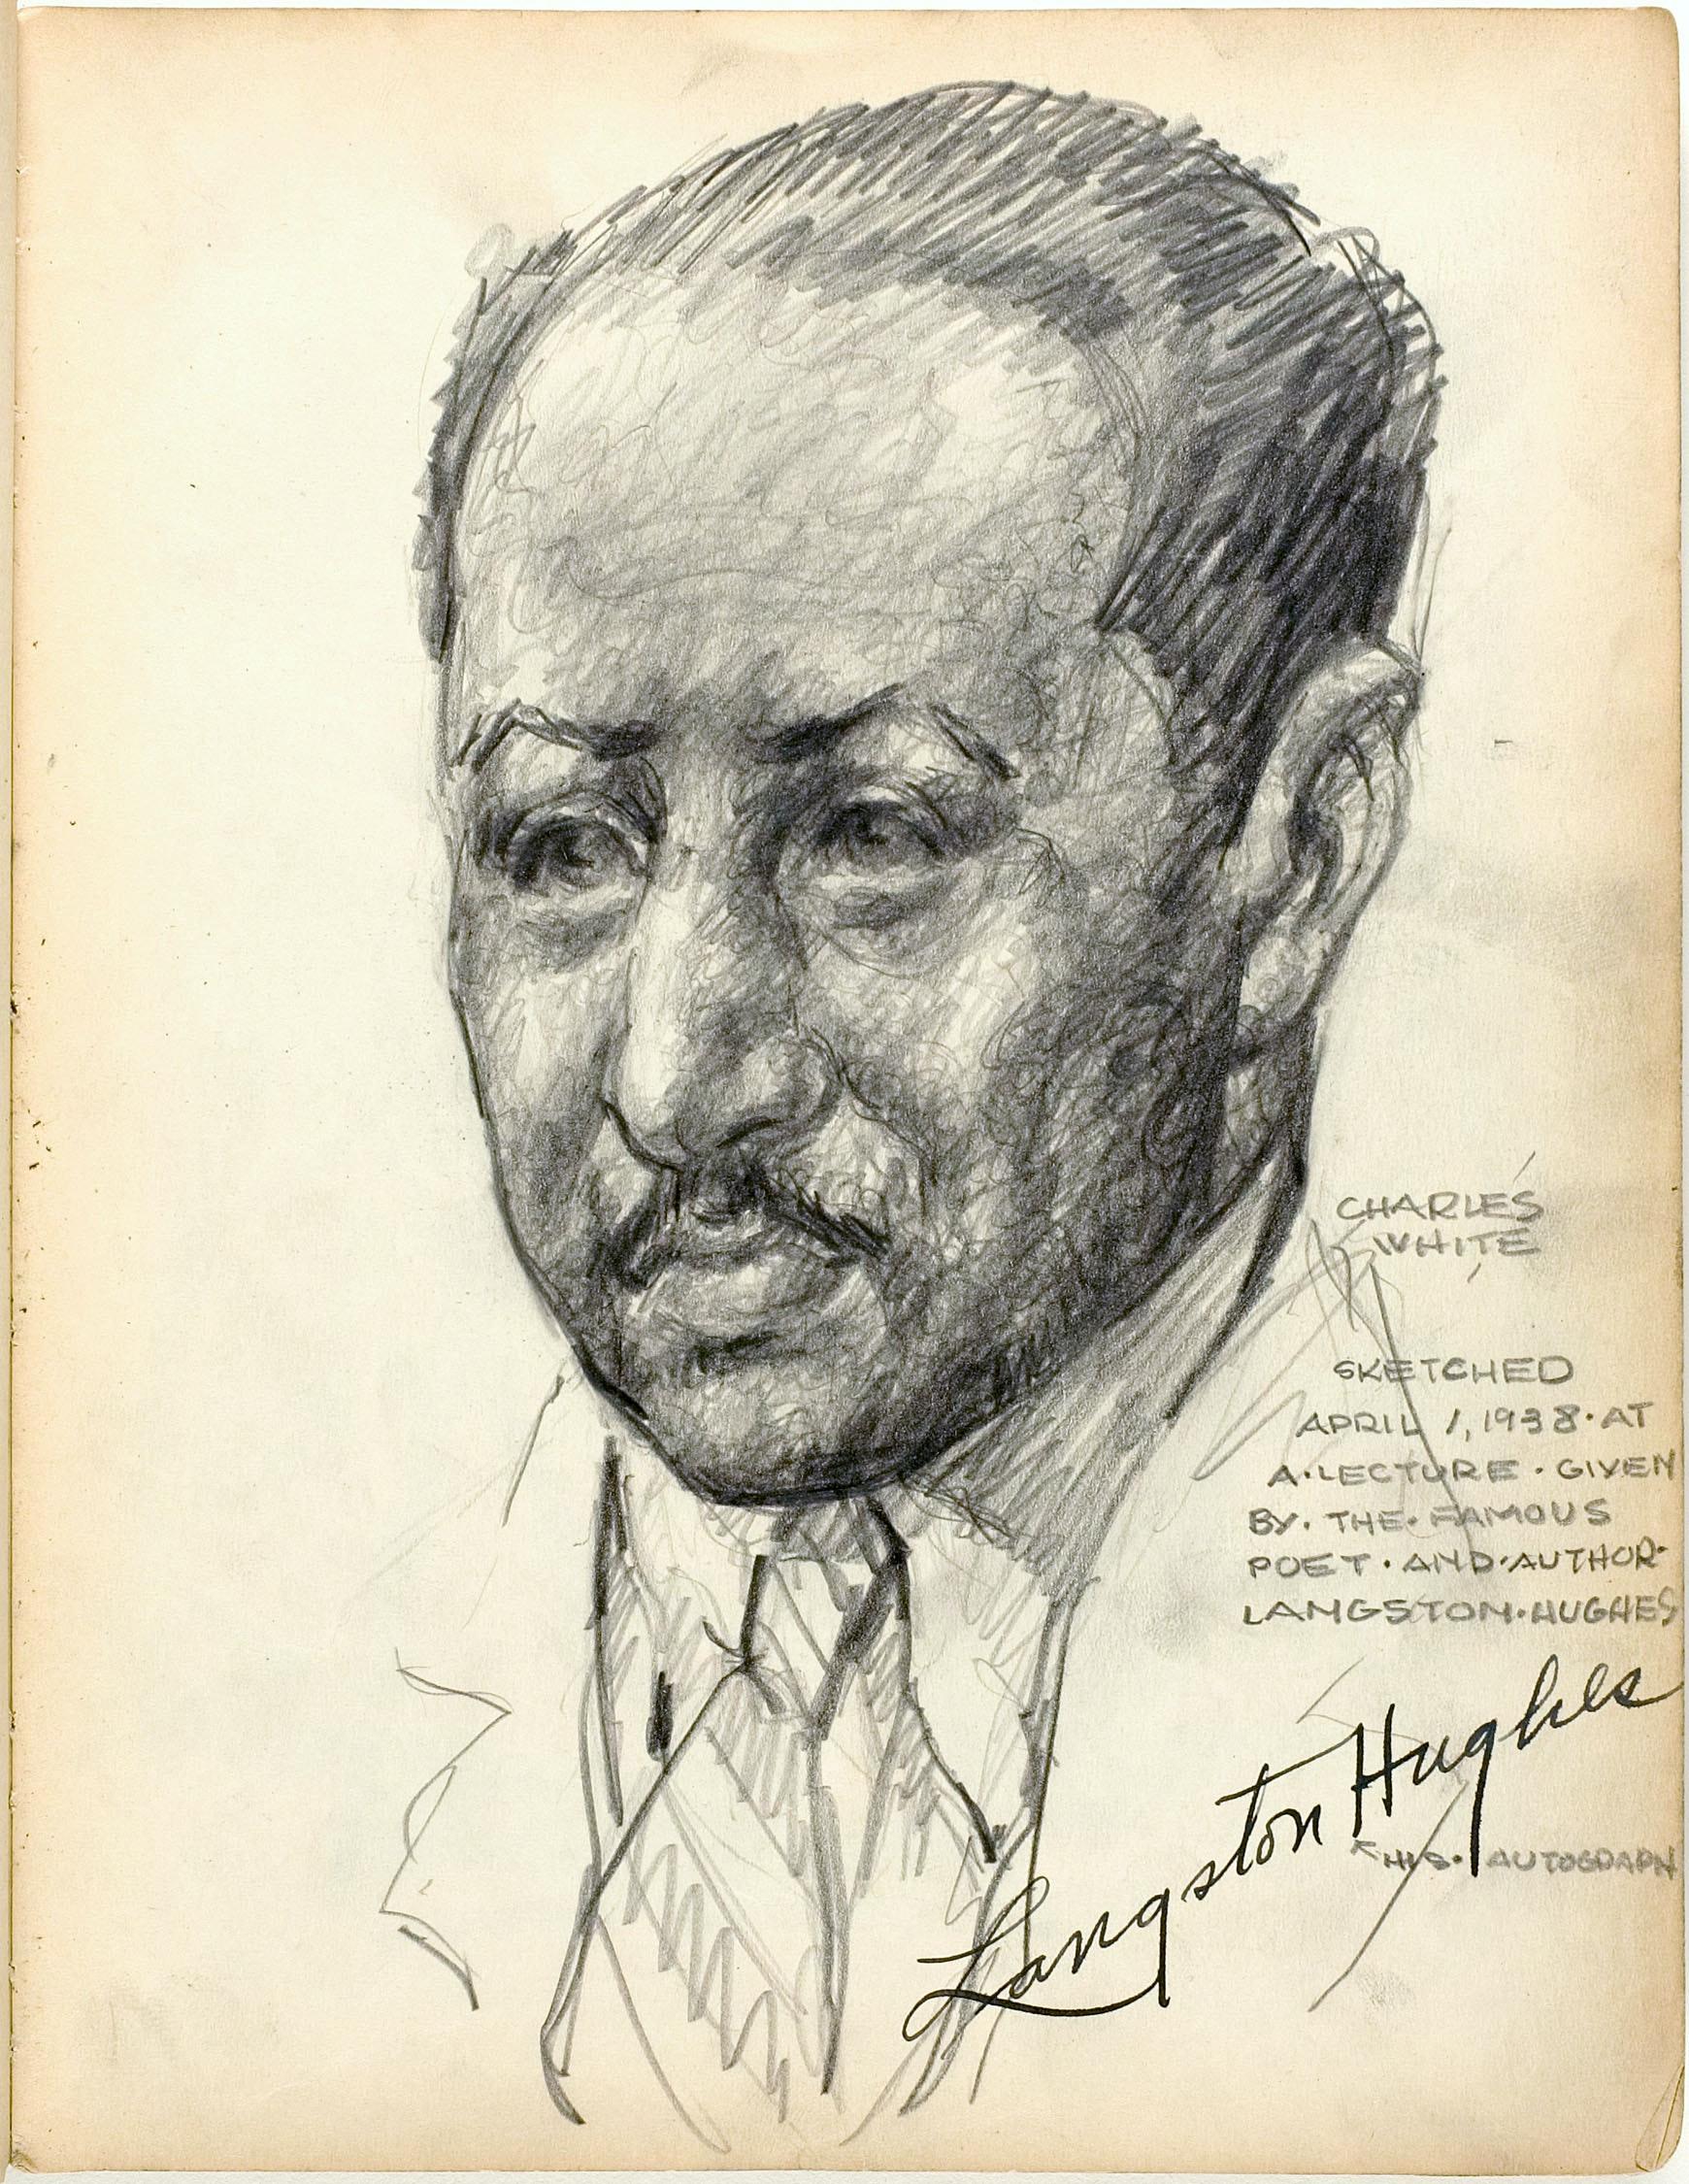 Charles White sketch of Langston Hughes